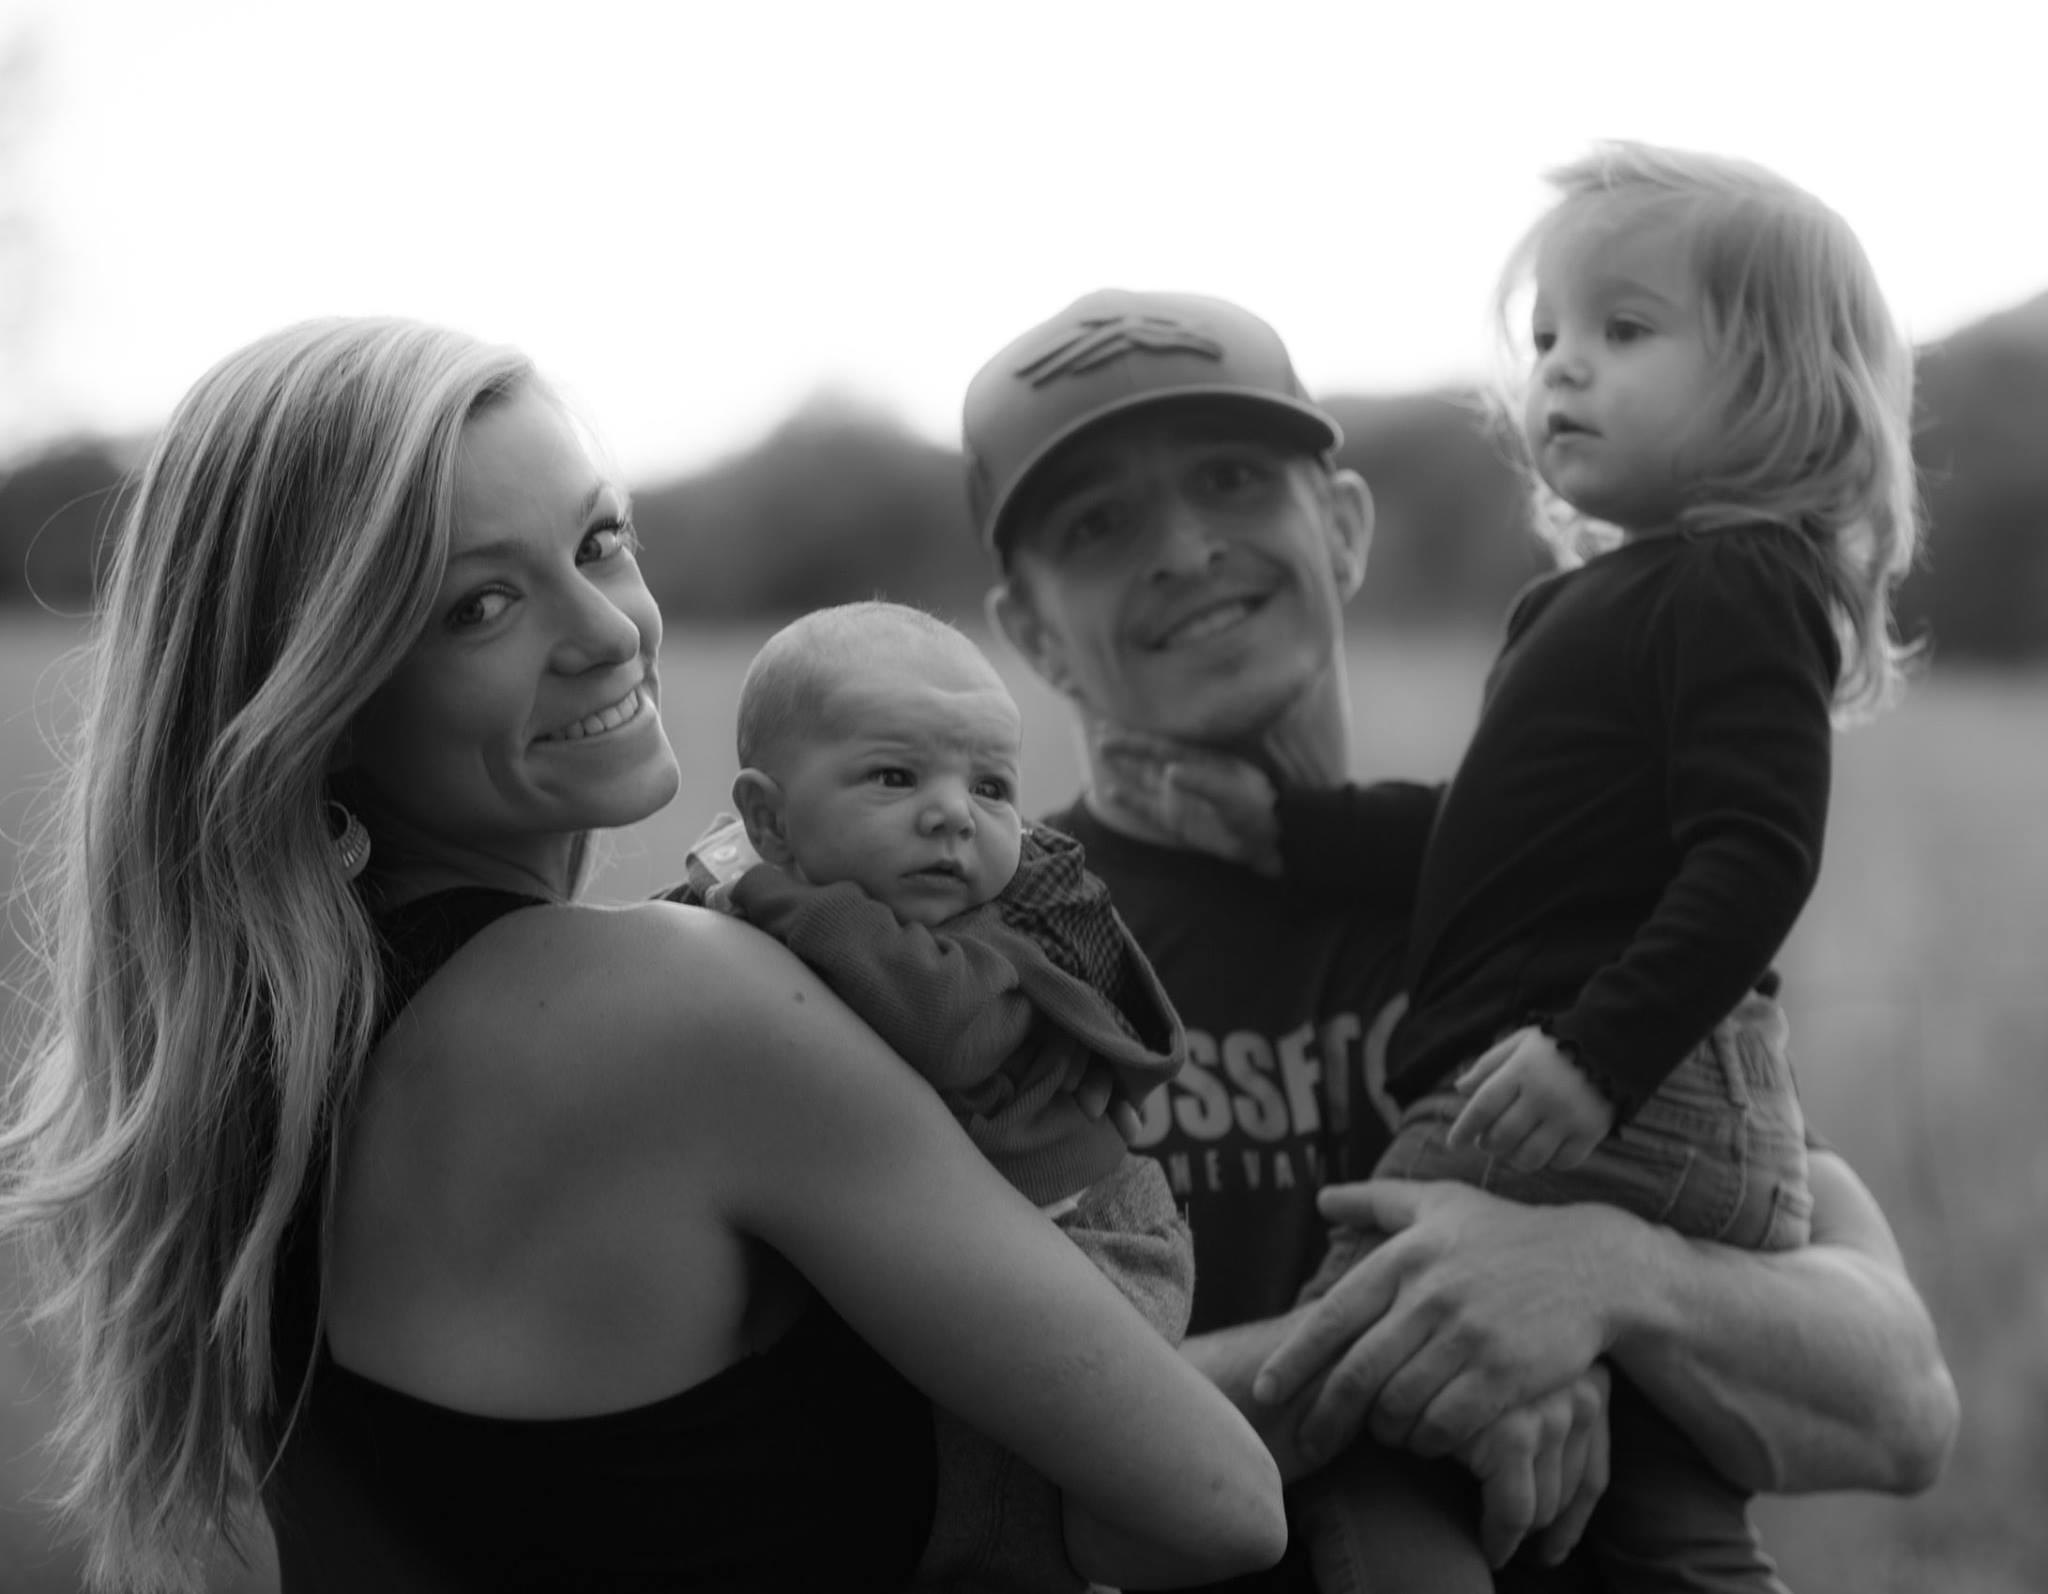 Dan, Alicia, and their adorable children.